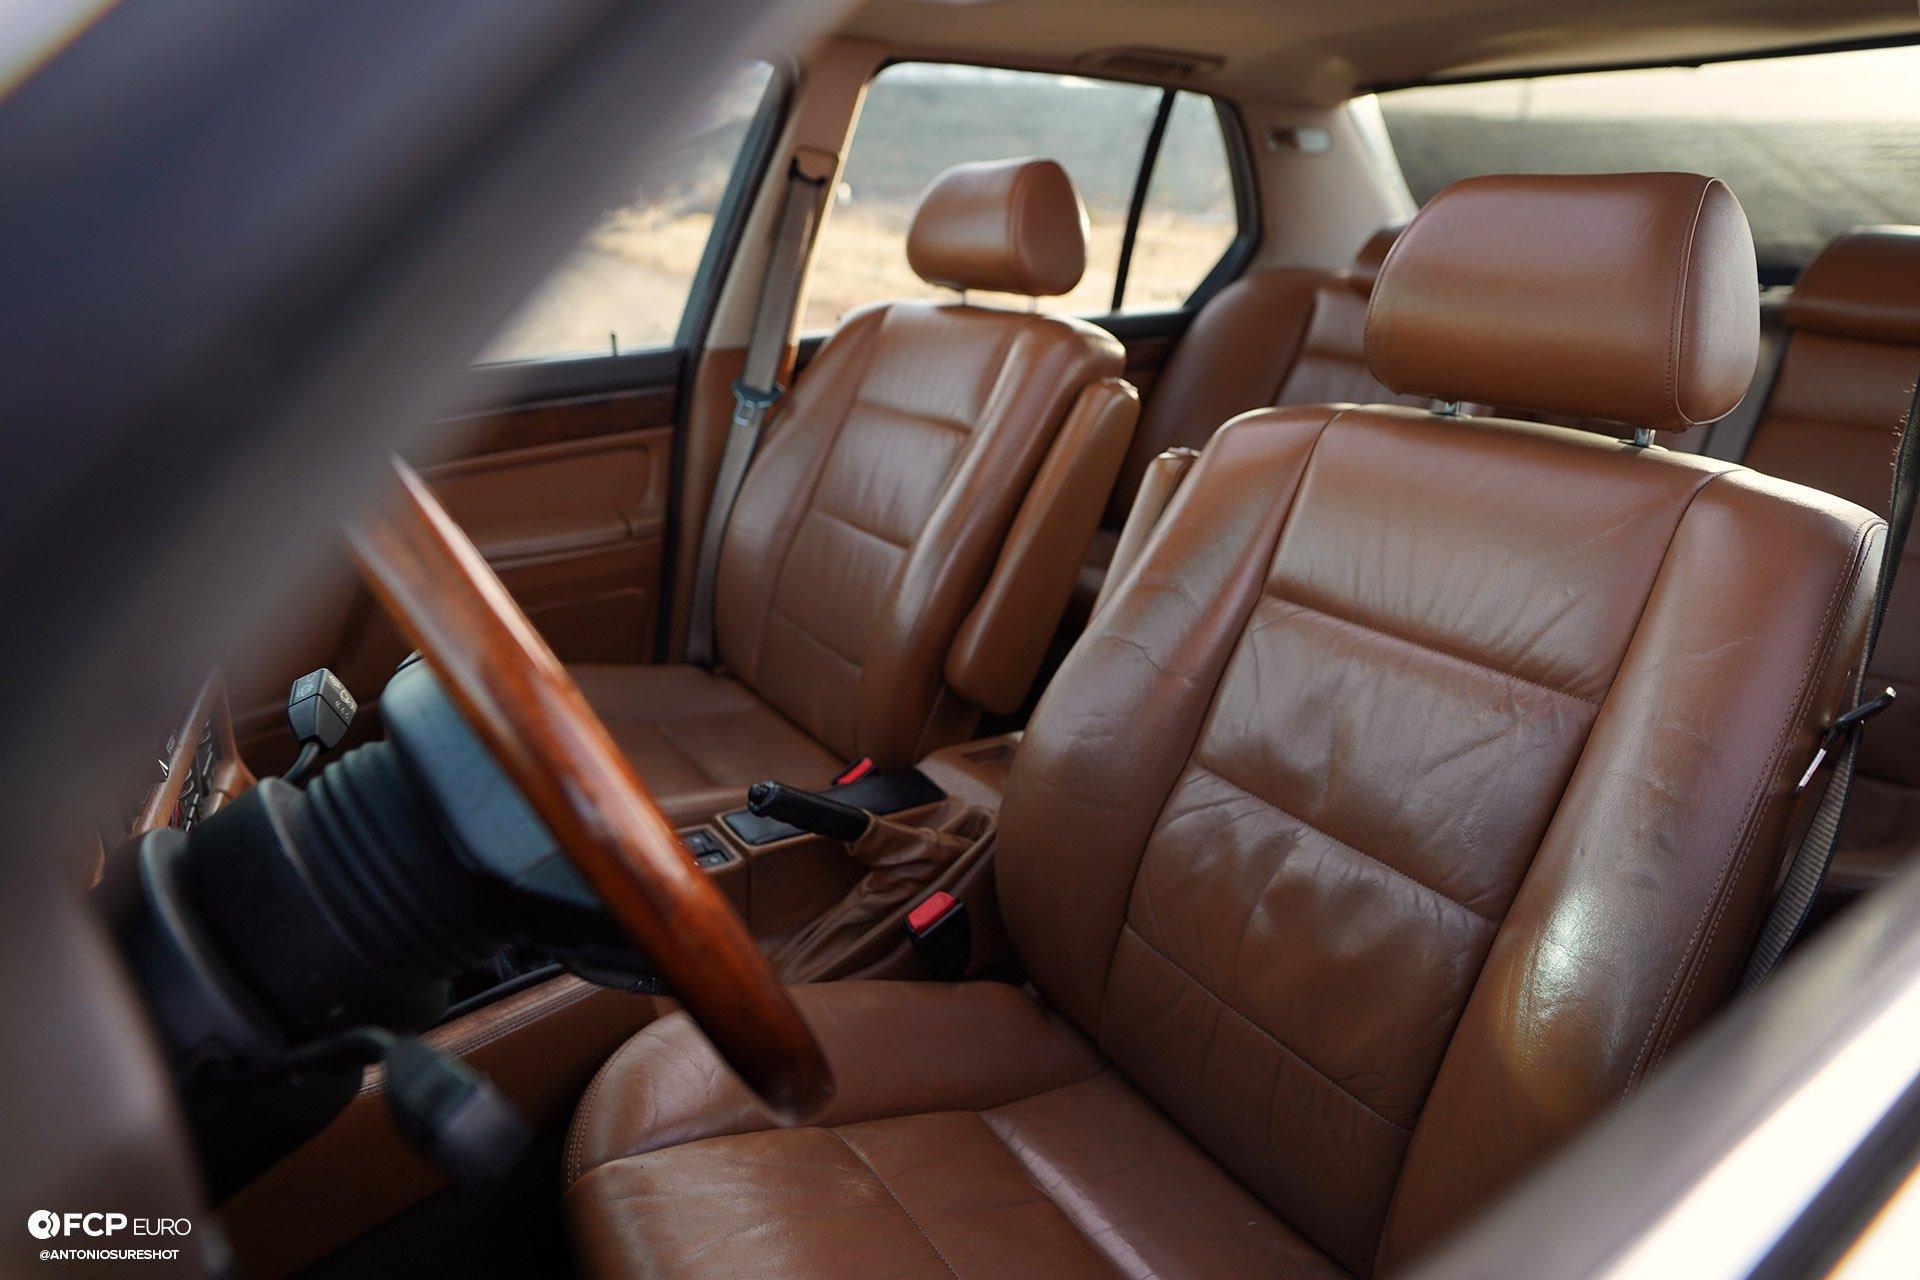 BMW E32 750iL 6 speed A9A02547